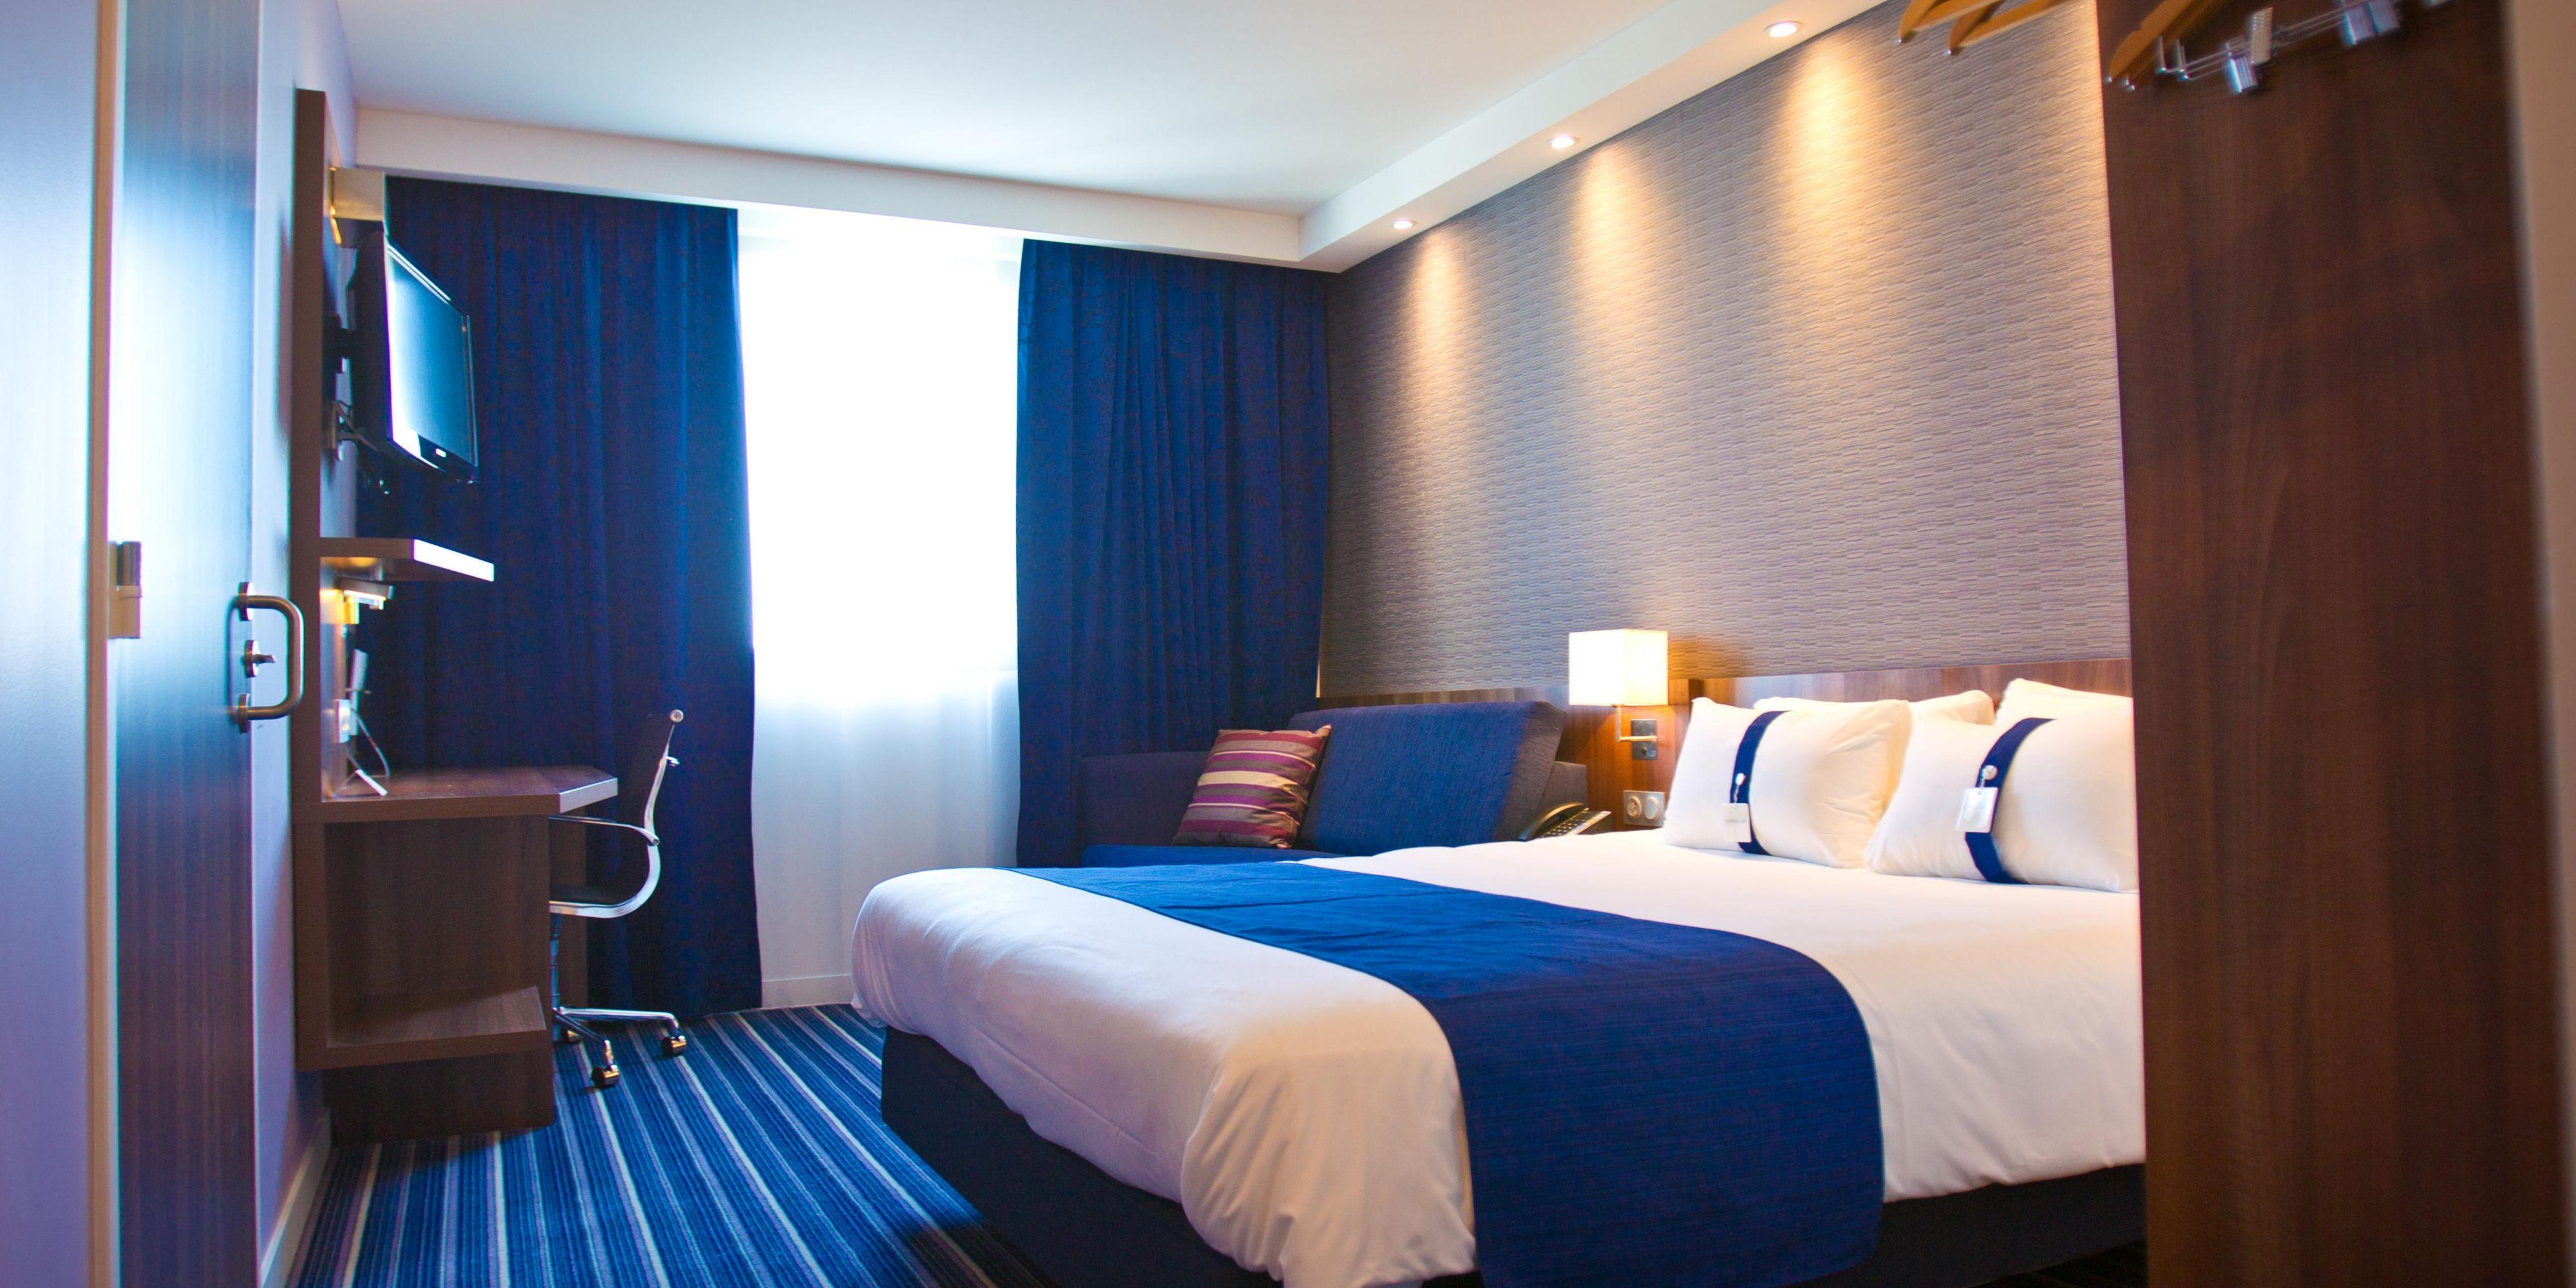 Holiday Inn Express Dijon Hotel by IHG